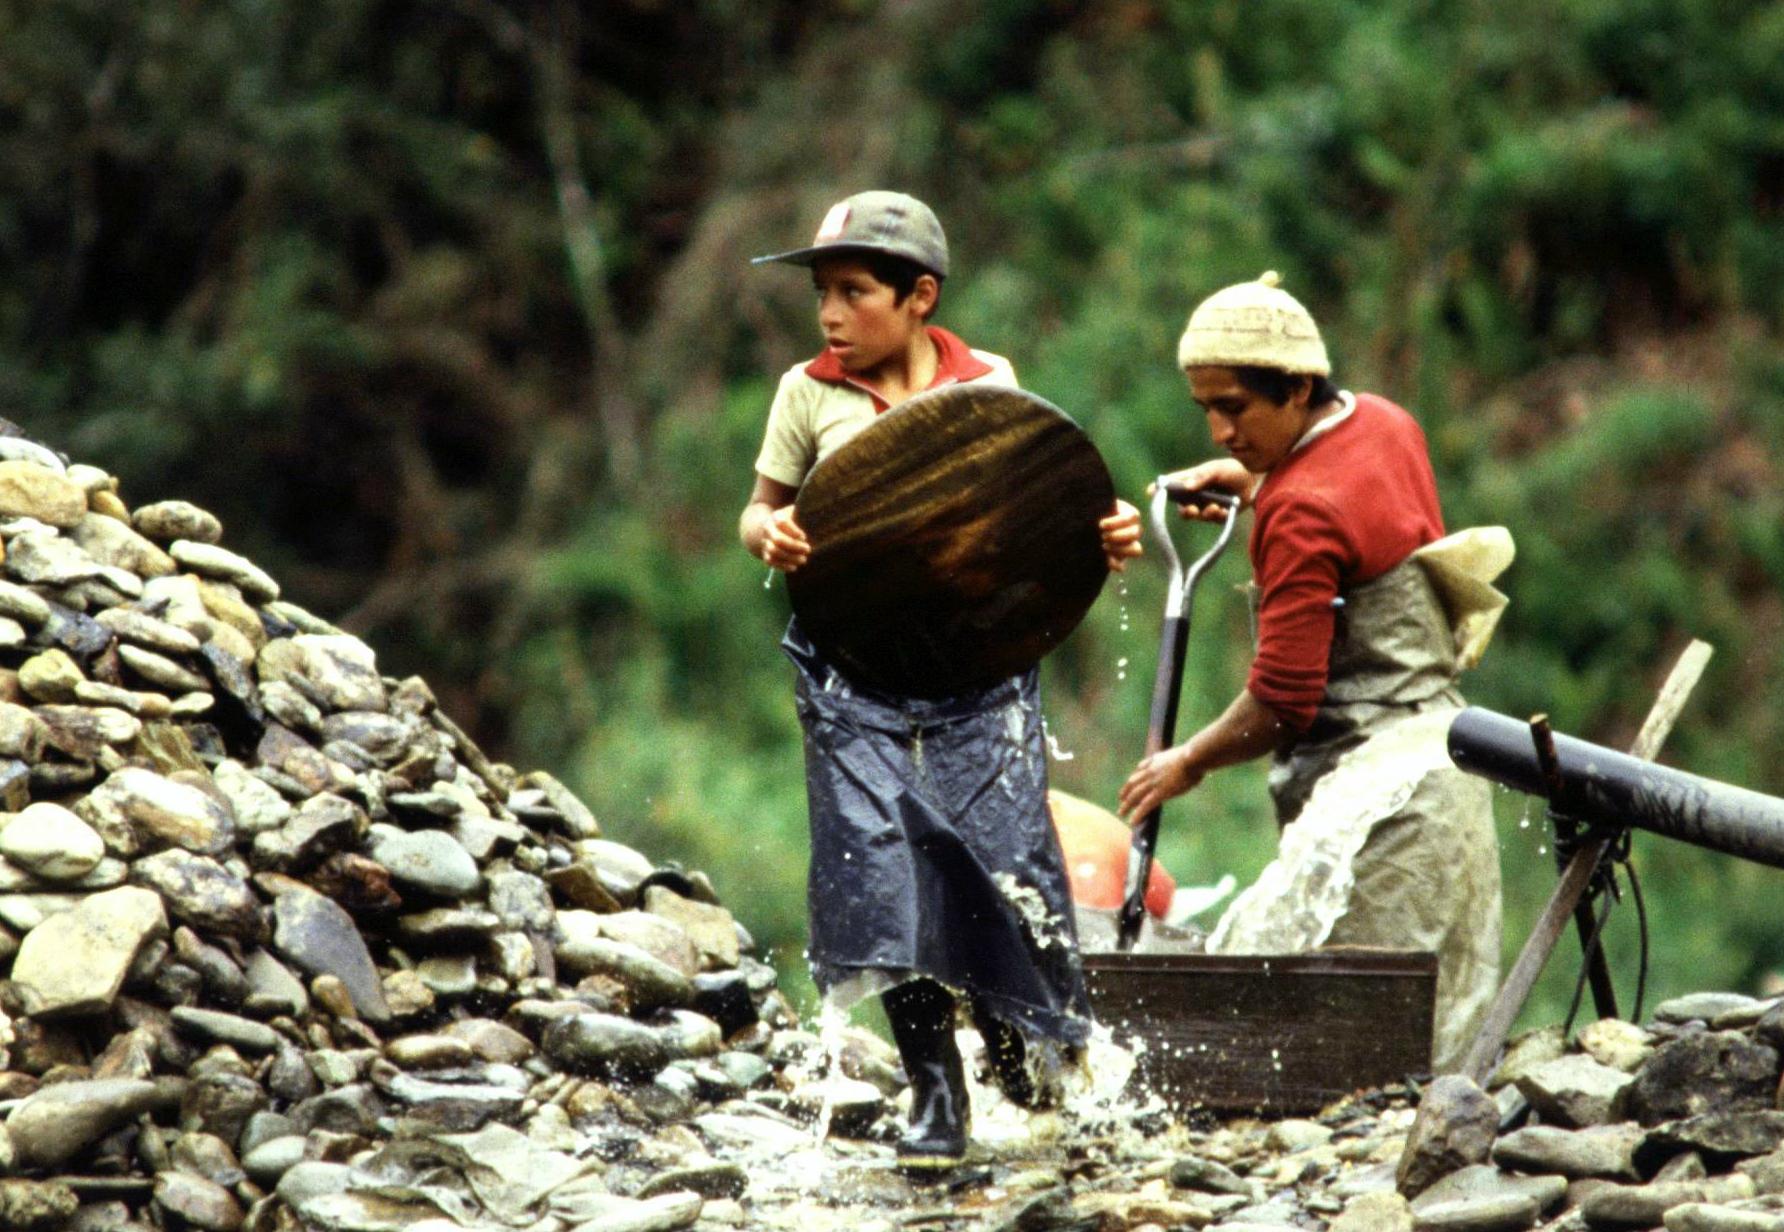 Child Labor in Morona Santiago